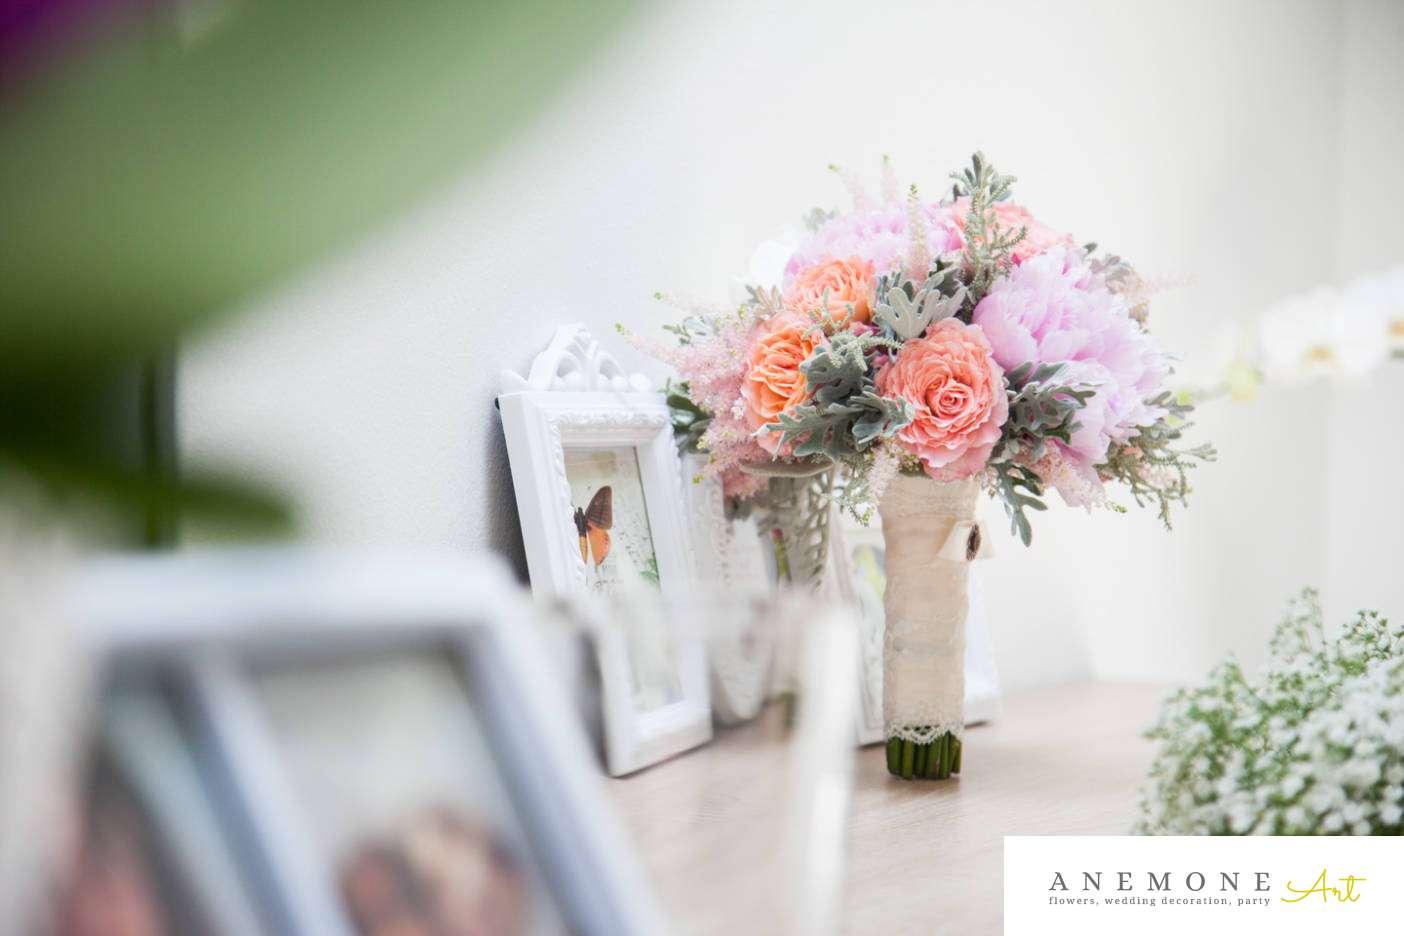 Poza, foto cu Flori de nunta astilbe, buchet mireasa, bujori, maner buchet, pastel, piersica, rotund, roz, trandafiri englezesti in Arad, Timisoara, Oradea (wedding flowers, bouquets) nunta Arad, Timisoara, Oradea